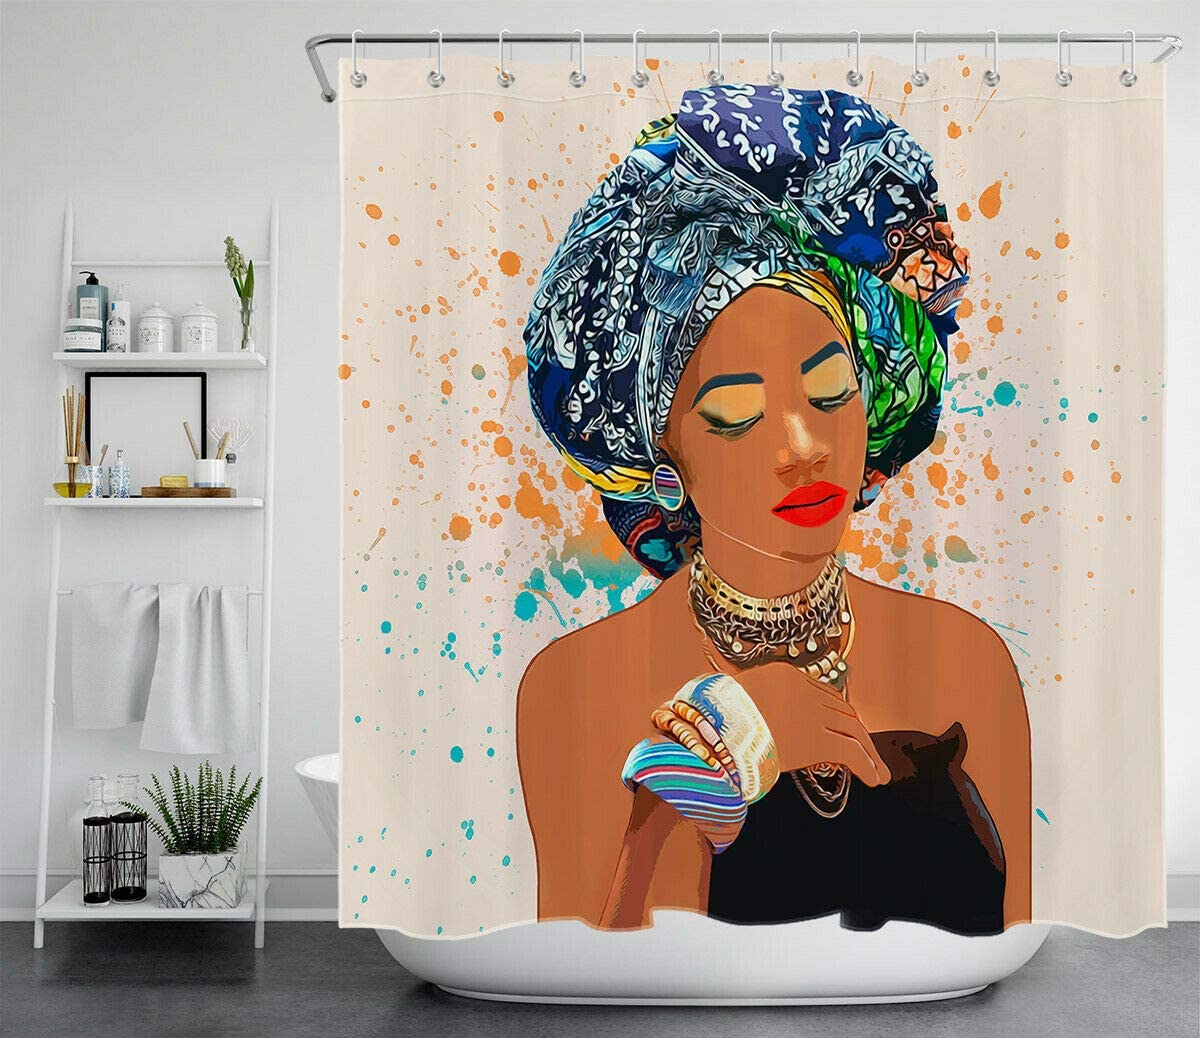 Lumengqi Pa/ñuelo Colorido Africano Hermosa ni/ña Mujer Cortina de Ducha Impermeable Decorativa con impresi/ón HD 180X180cm 12 Ganchos Gratis Adecuada para ba/ño